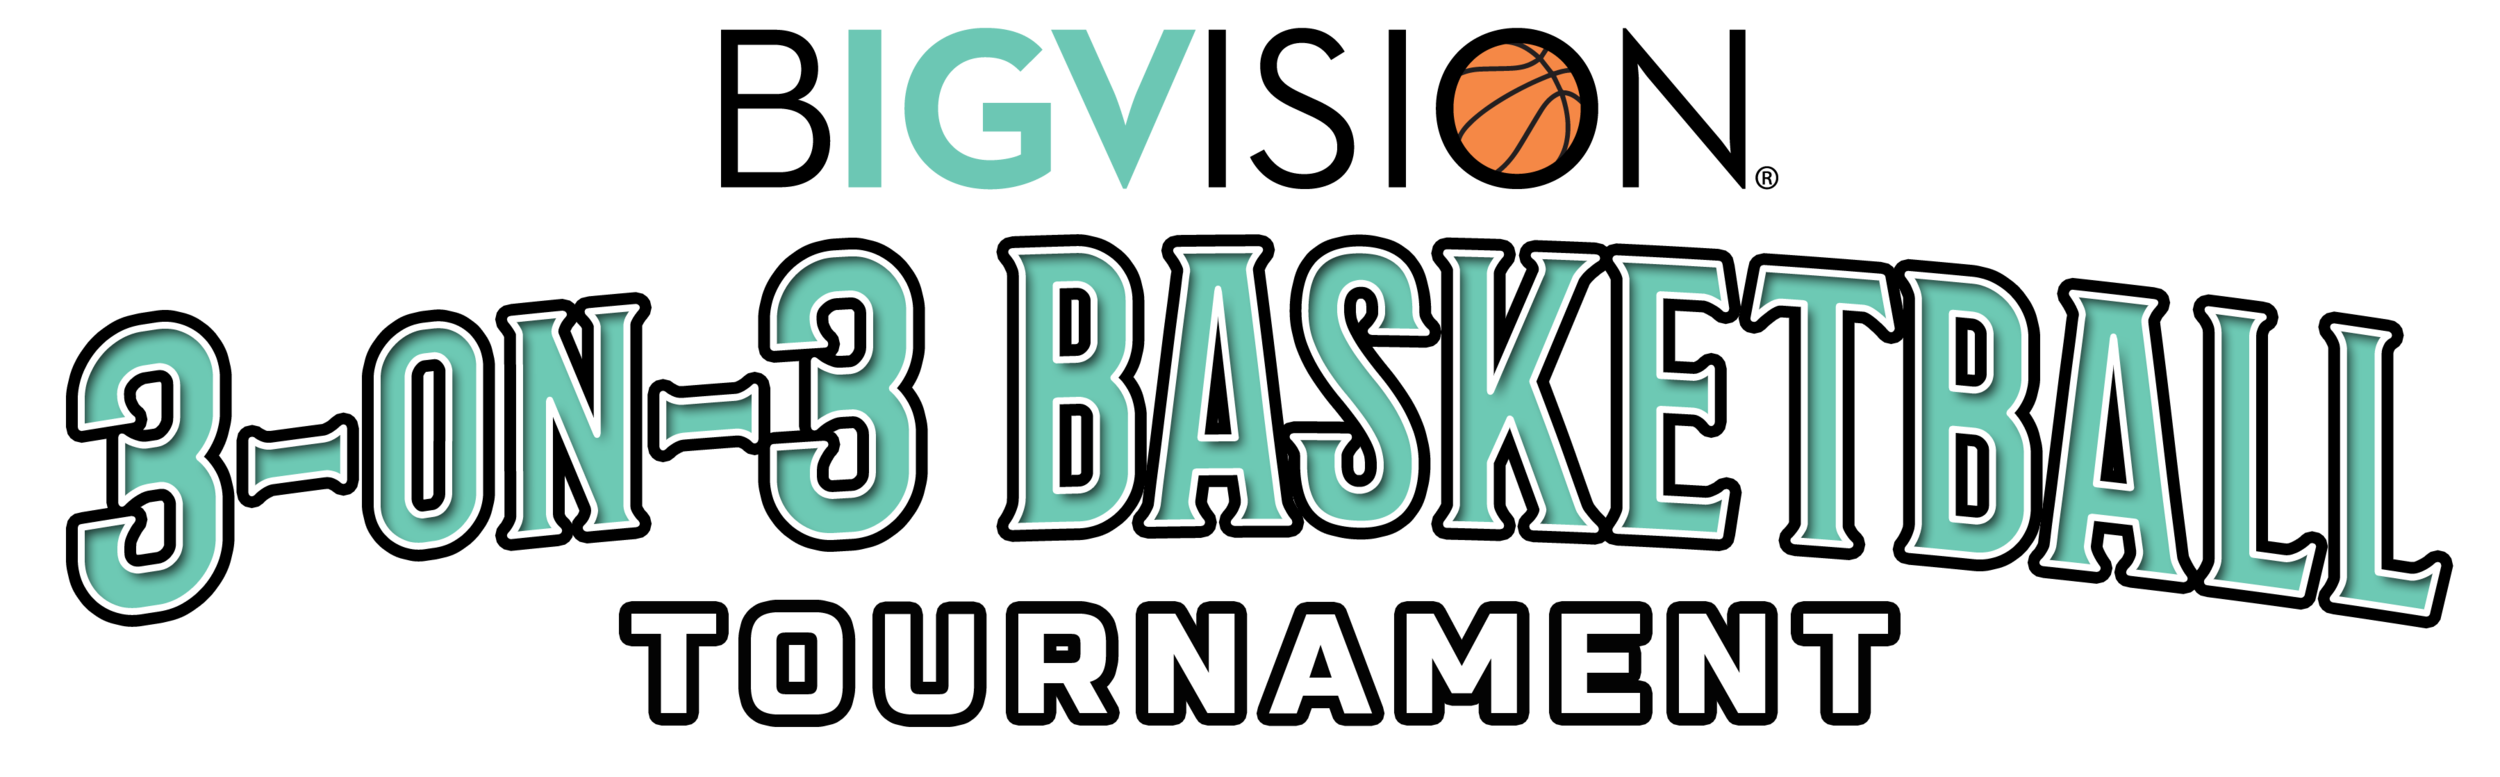 BV_3-on-3_Basketball_Lockup.png